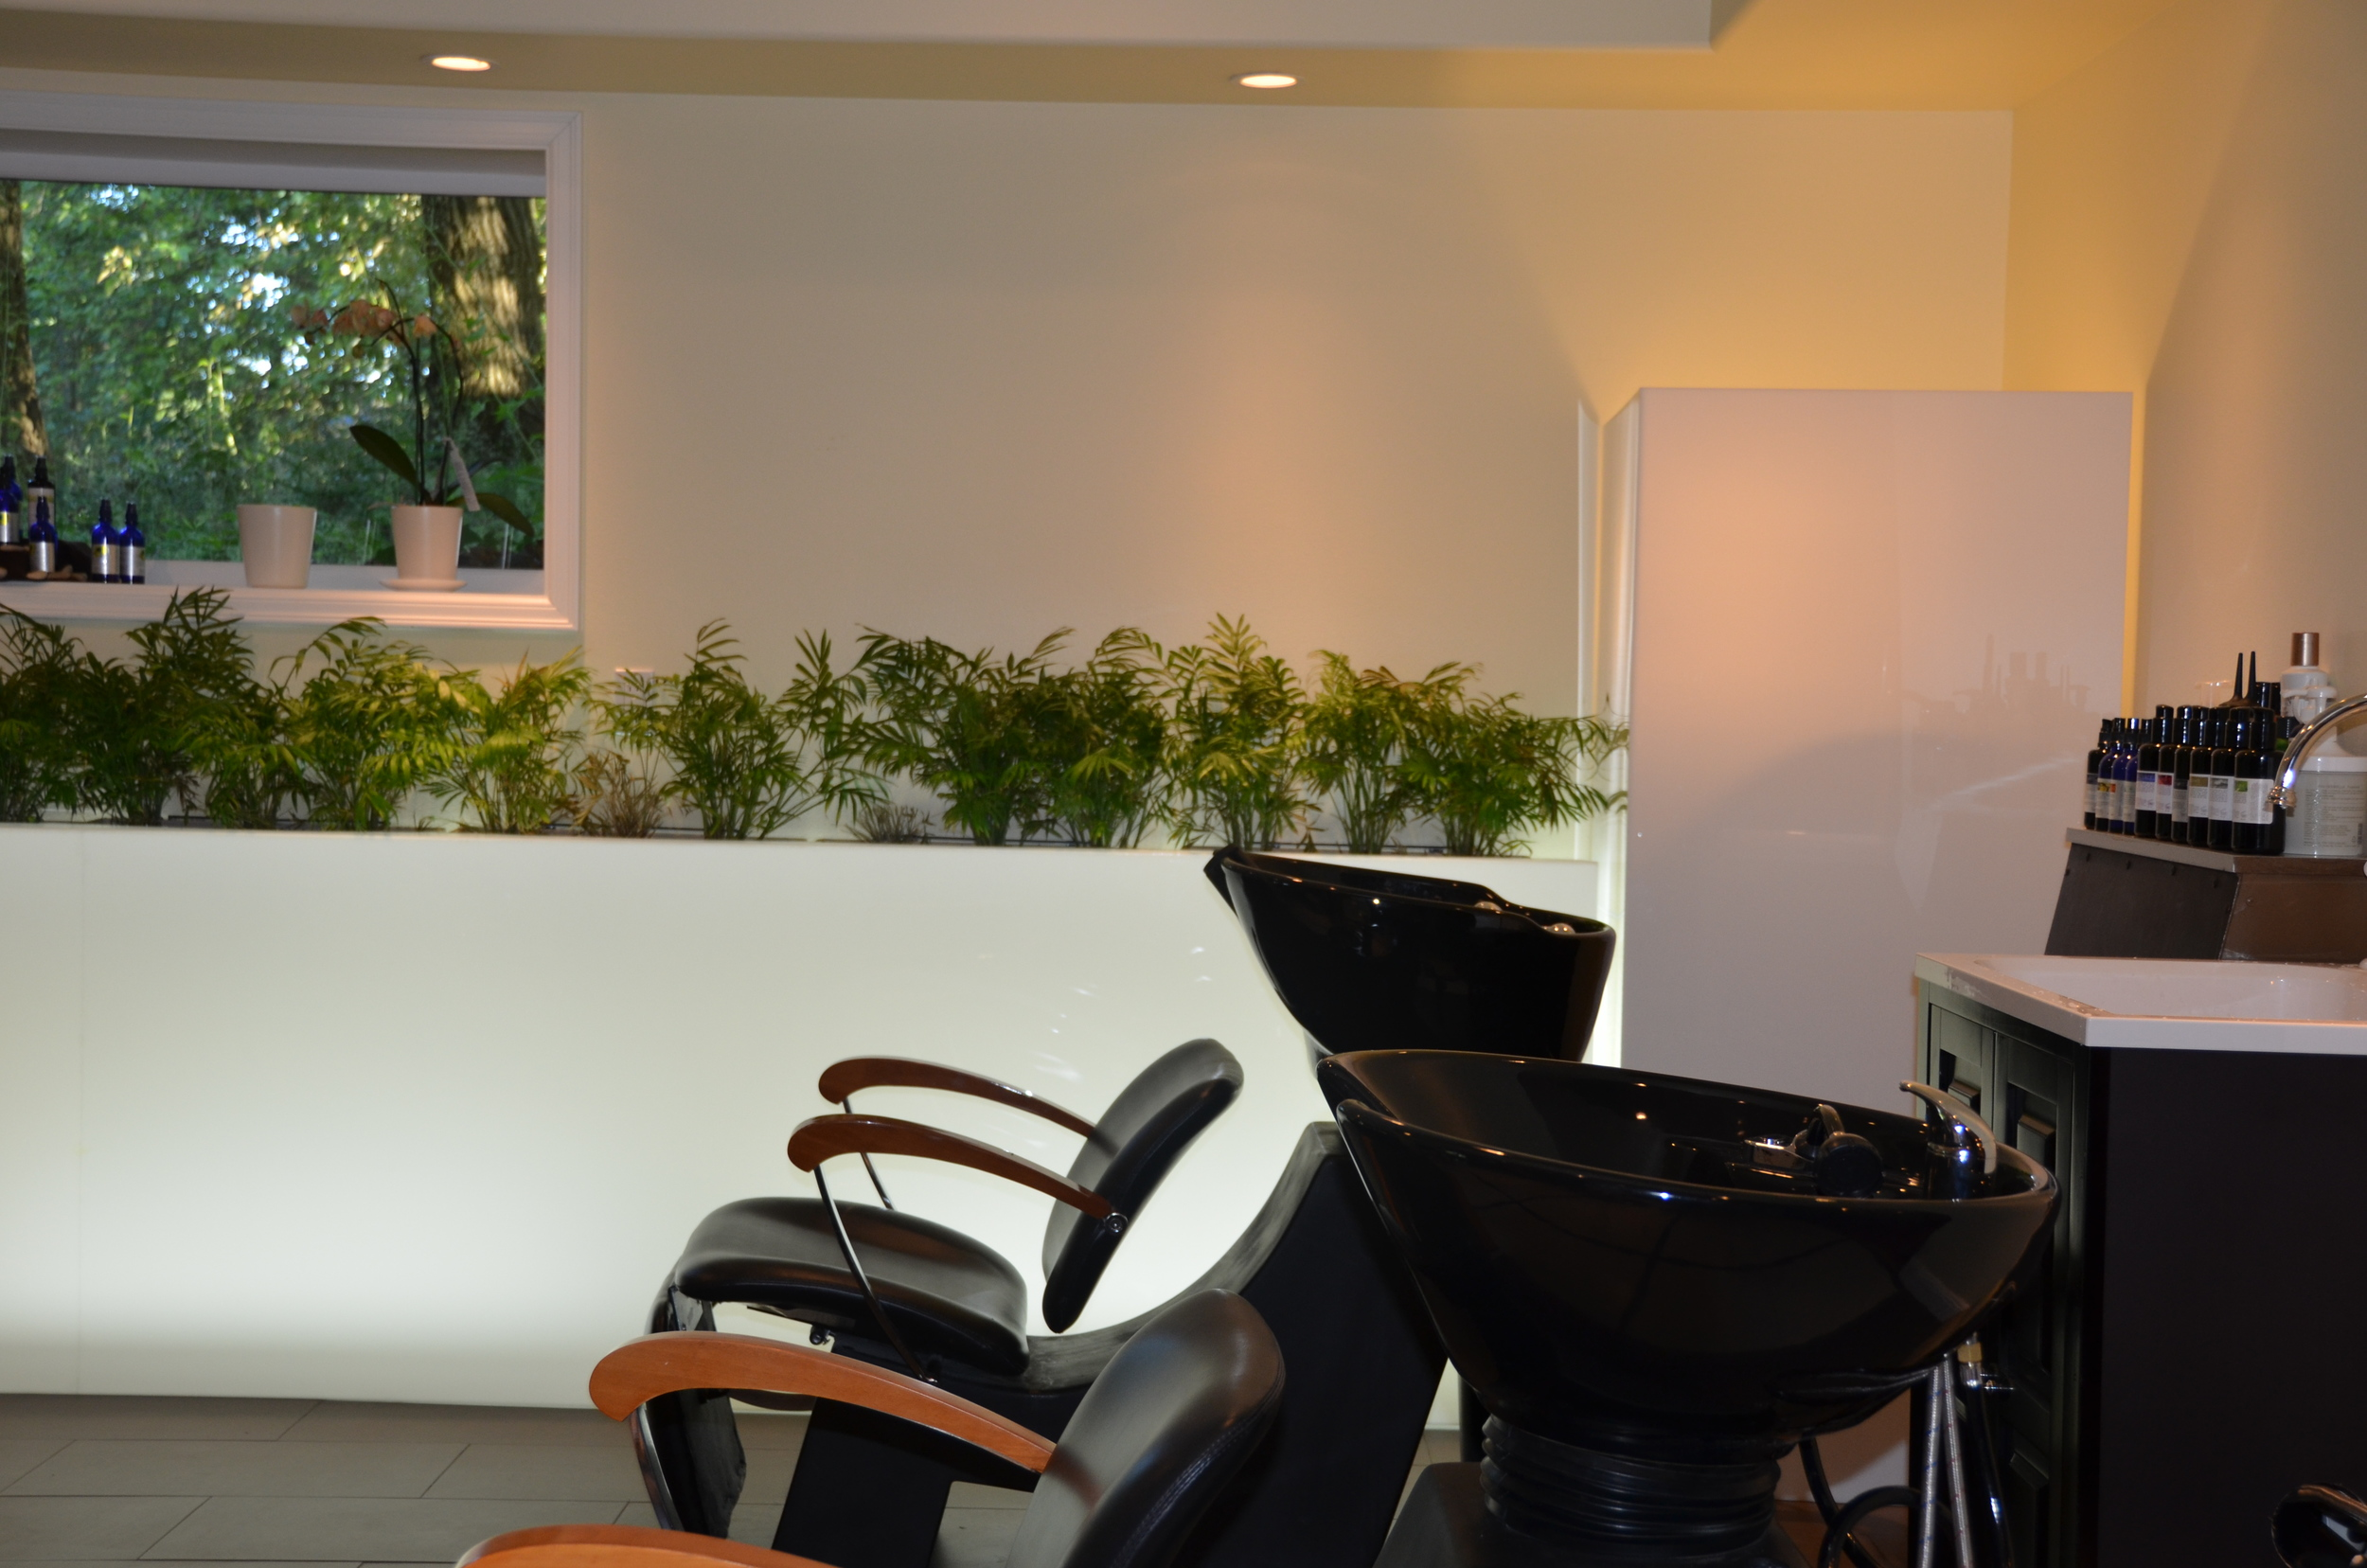 salon pictures for Craigslist 034.JPG